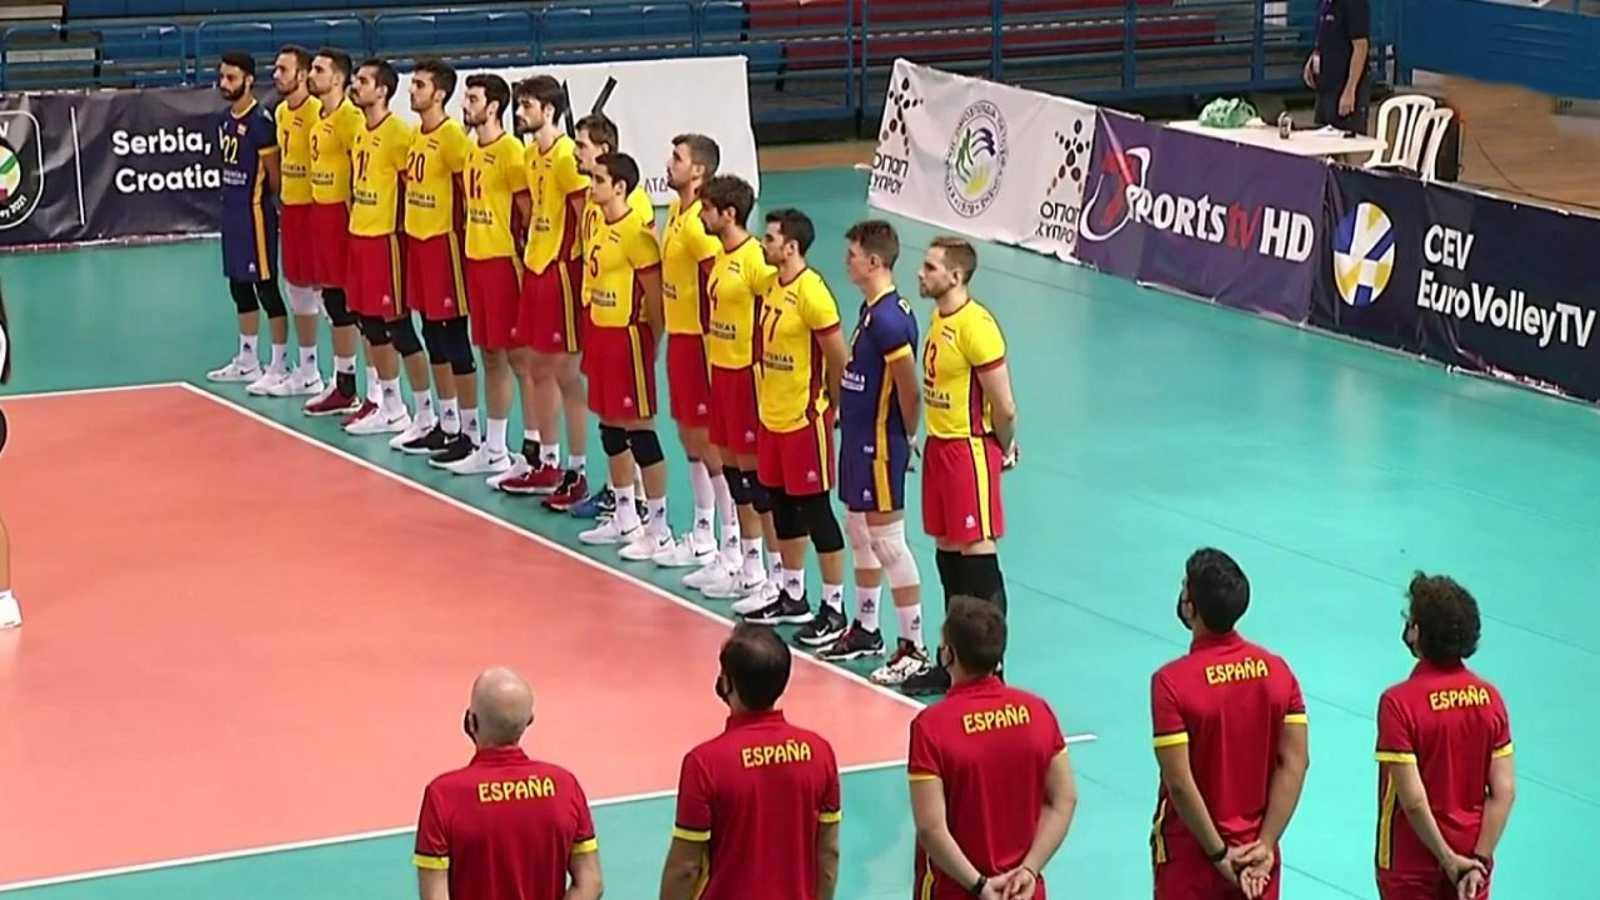 Voleibol - Clasificación Campeonato de Europa masculino: Letonia-España. Desde Nicosia (Chipre) - ver ahora